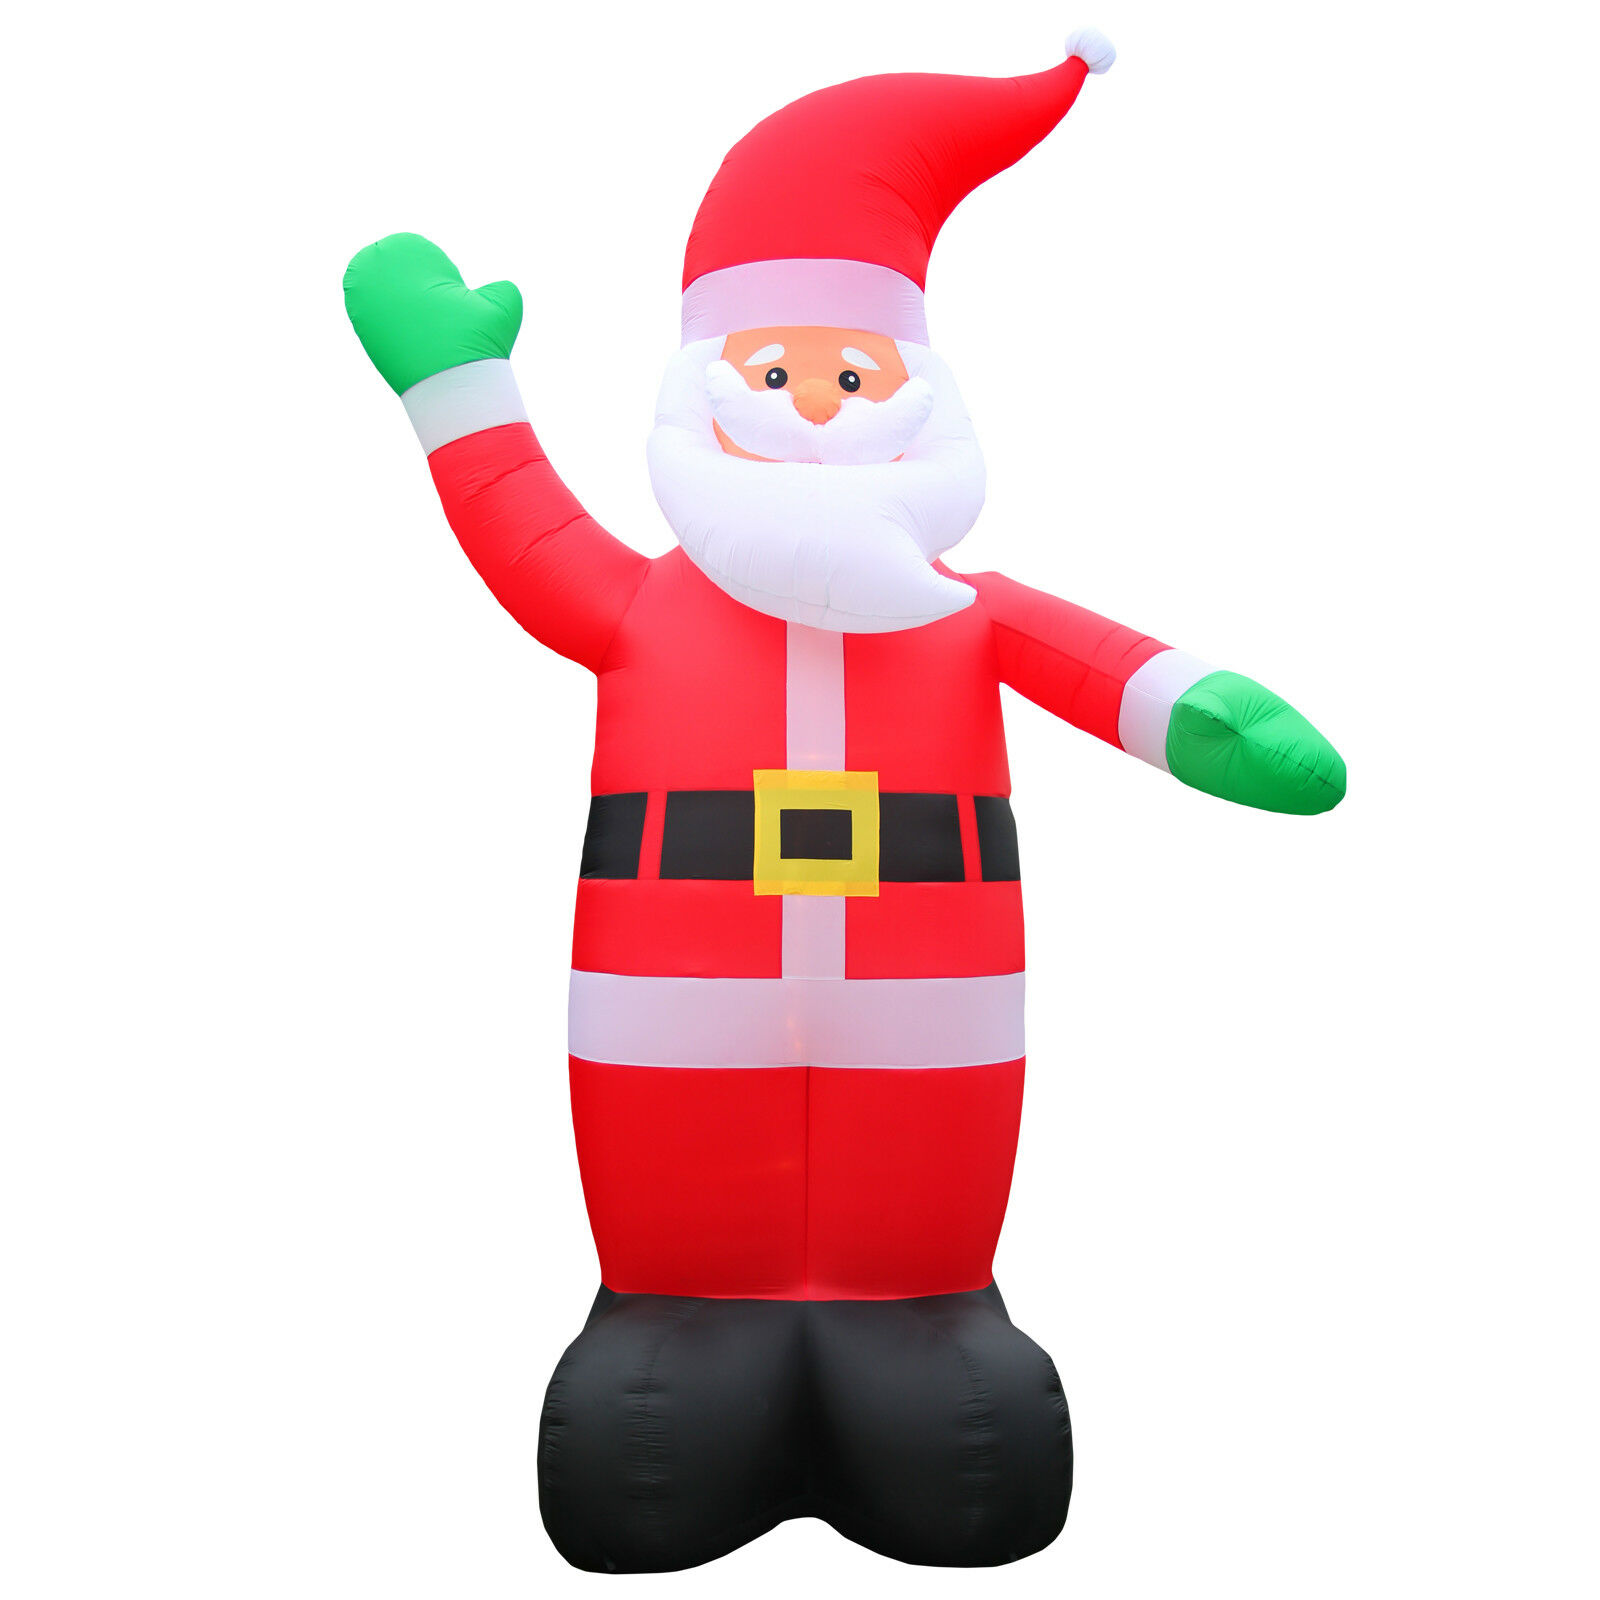 6 Meter Papá Noel Papá Noel Tamaño Decoración de Navidad Aussendekoration